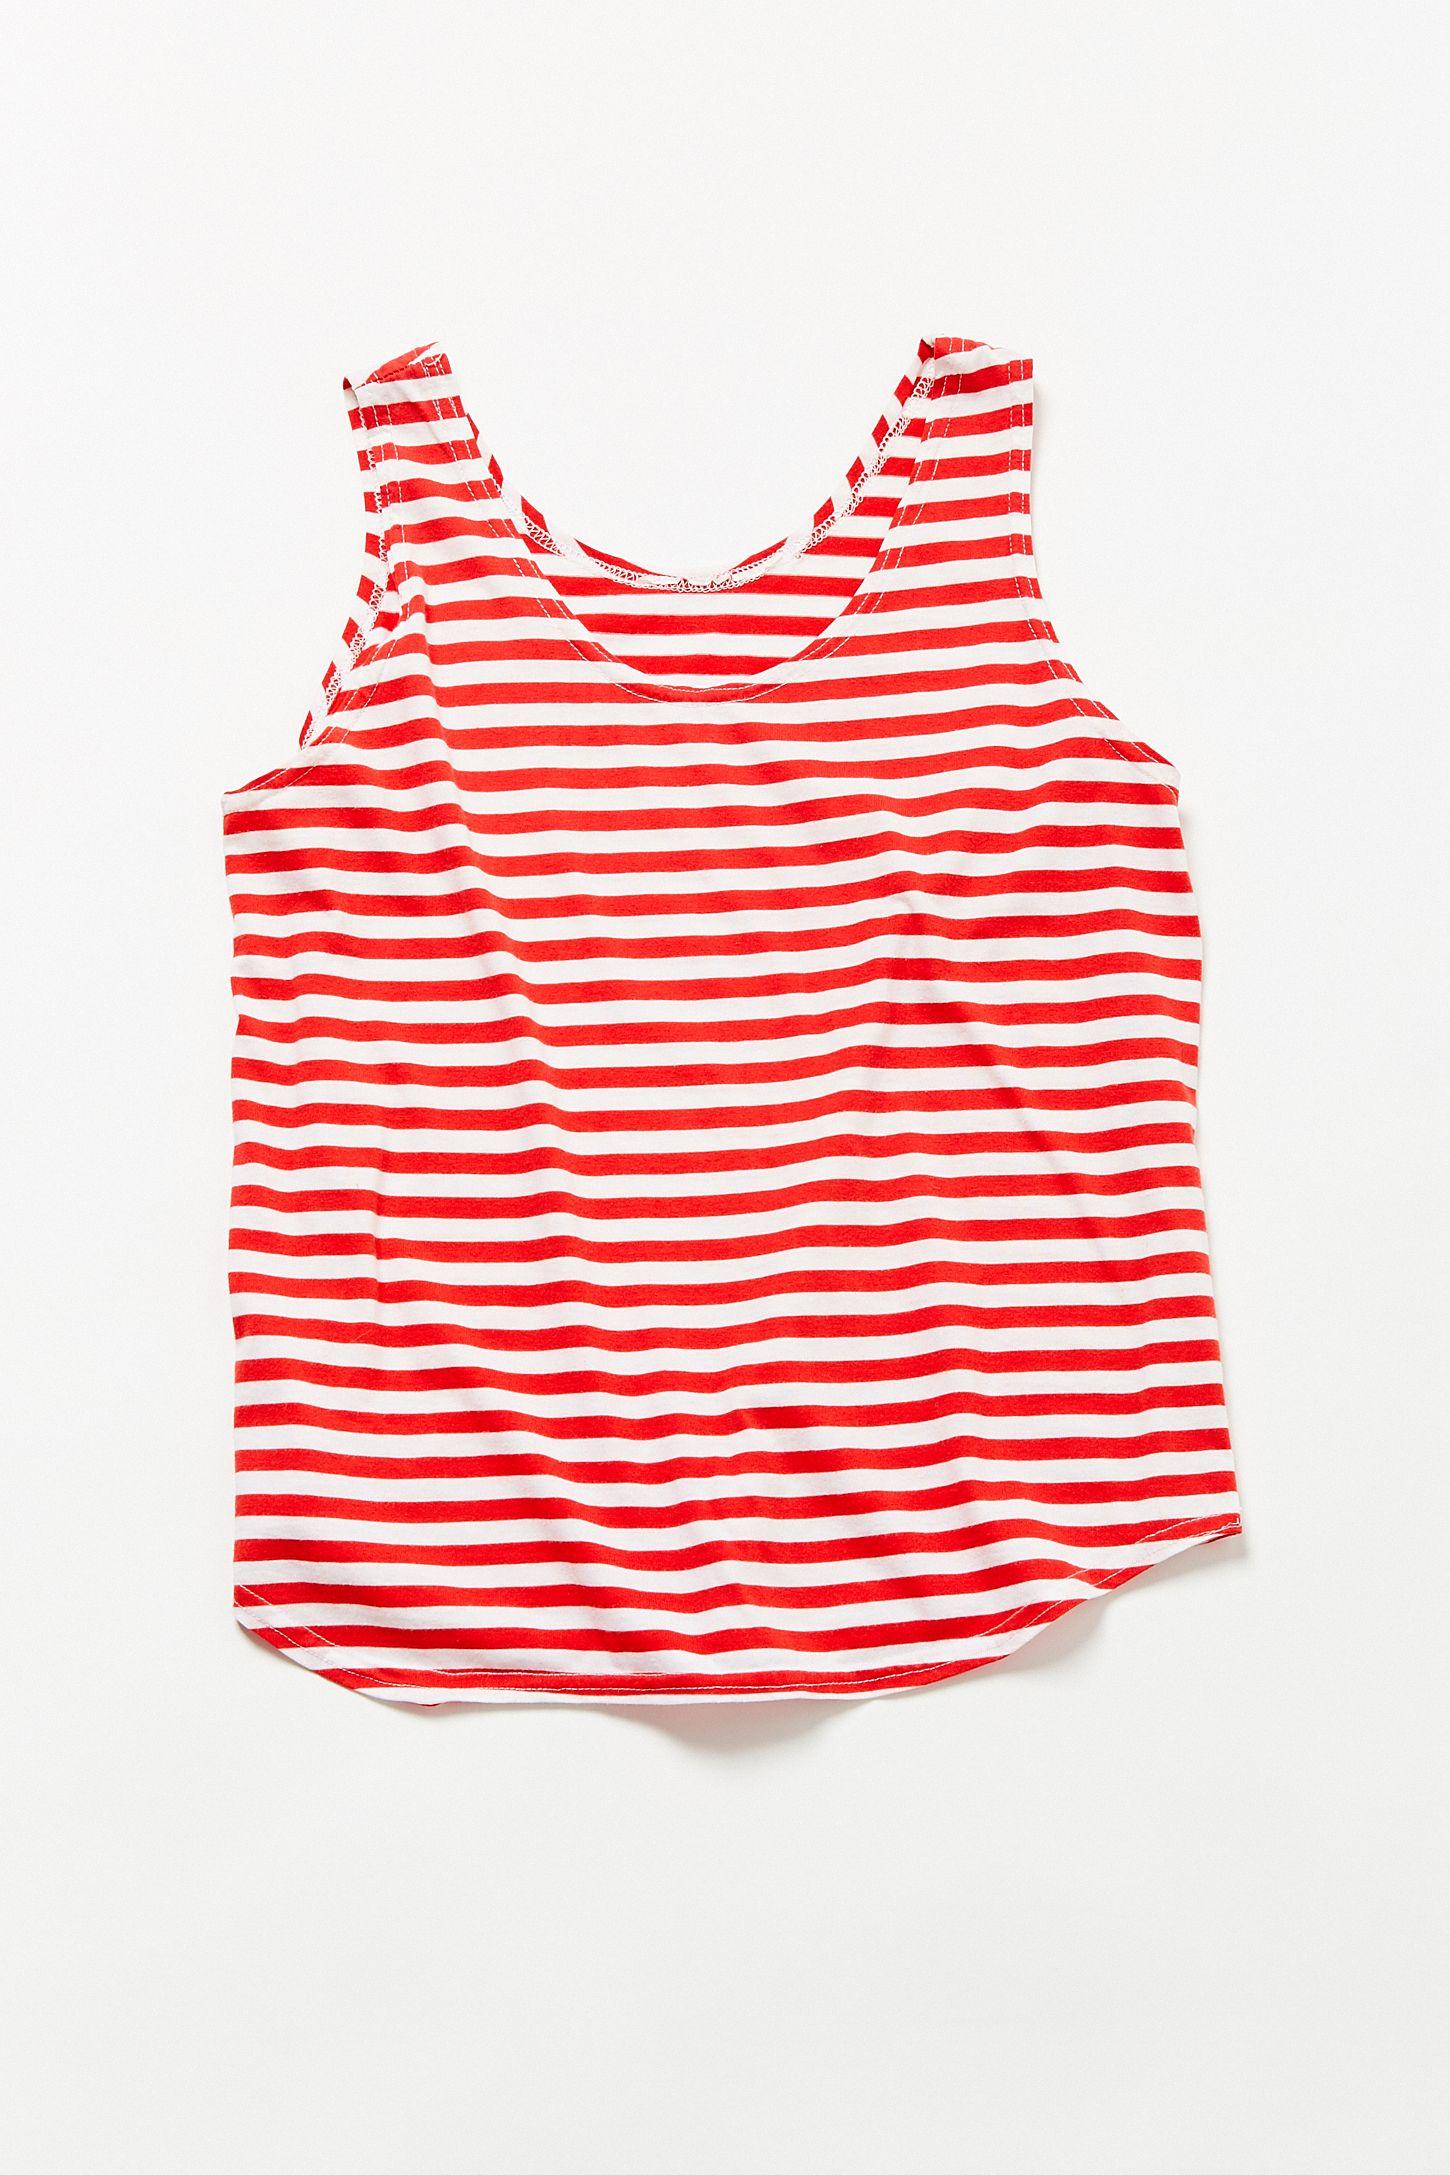 7488e649967711 Vintage  90s Red + White Striped Tank Top